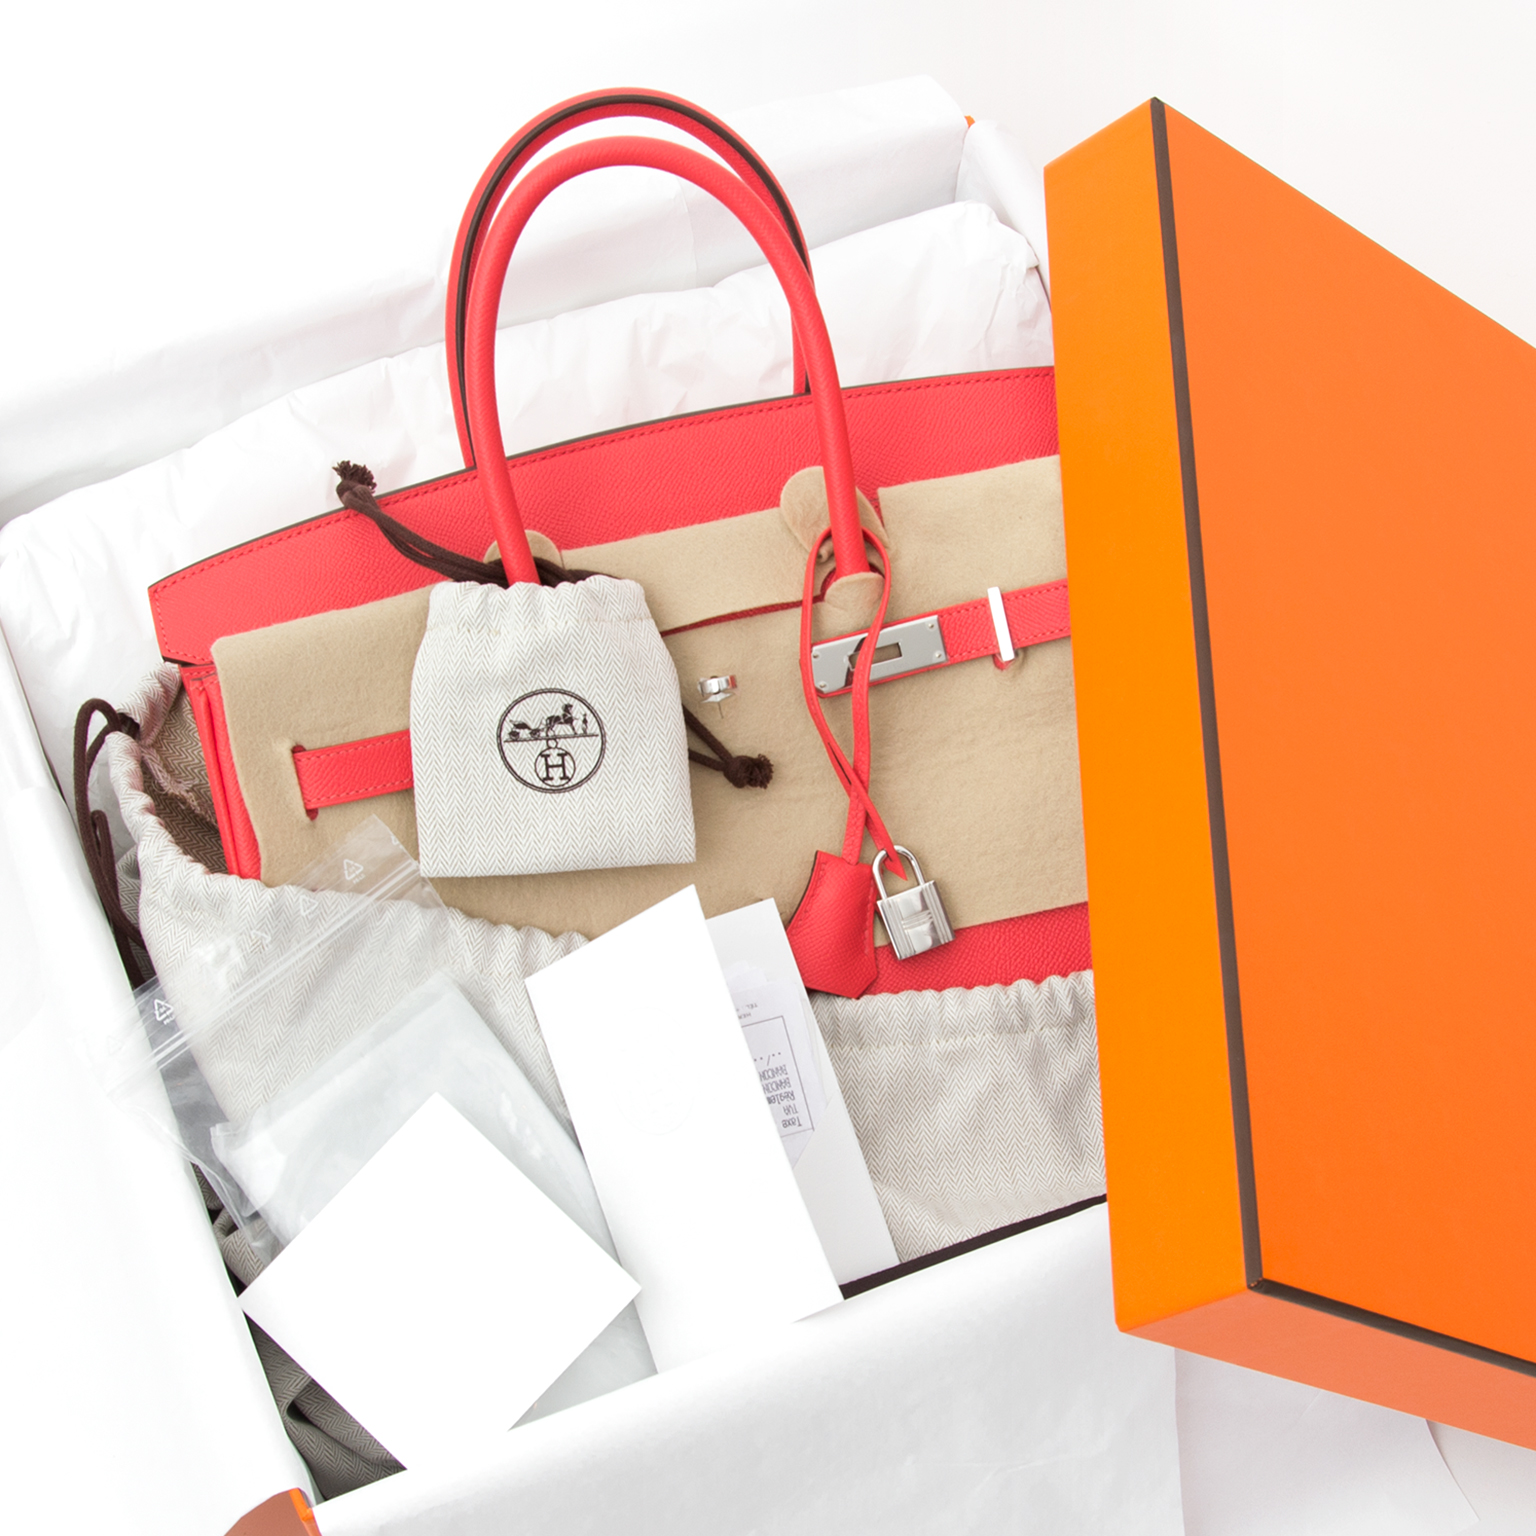 BRAND NEW Hermès Birkin Bag 35 Epsom Rose Jaipur PHW. Buy authentic secondhand Hermès bags at the right price at LabelLOV vintage webshop. Safe and secure online shopping. Koop authentieke tweedehands Hermès tassen aan de juiste prijs bij LabelLOV.